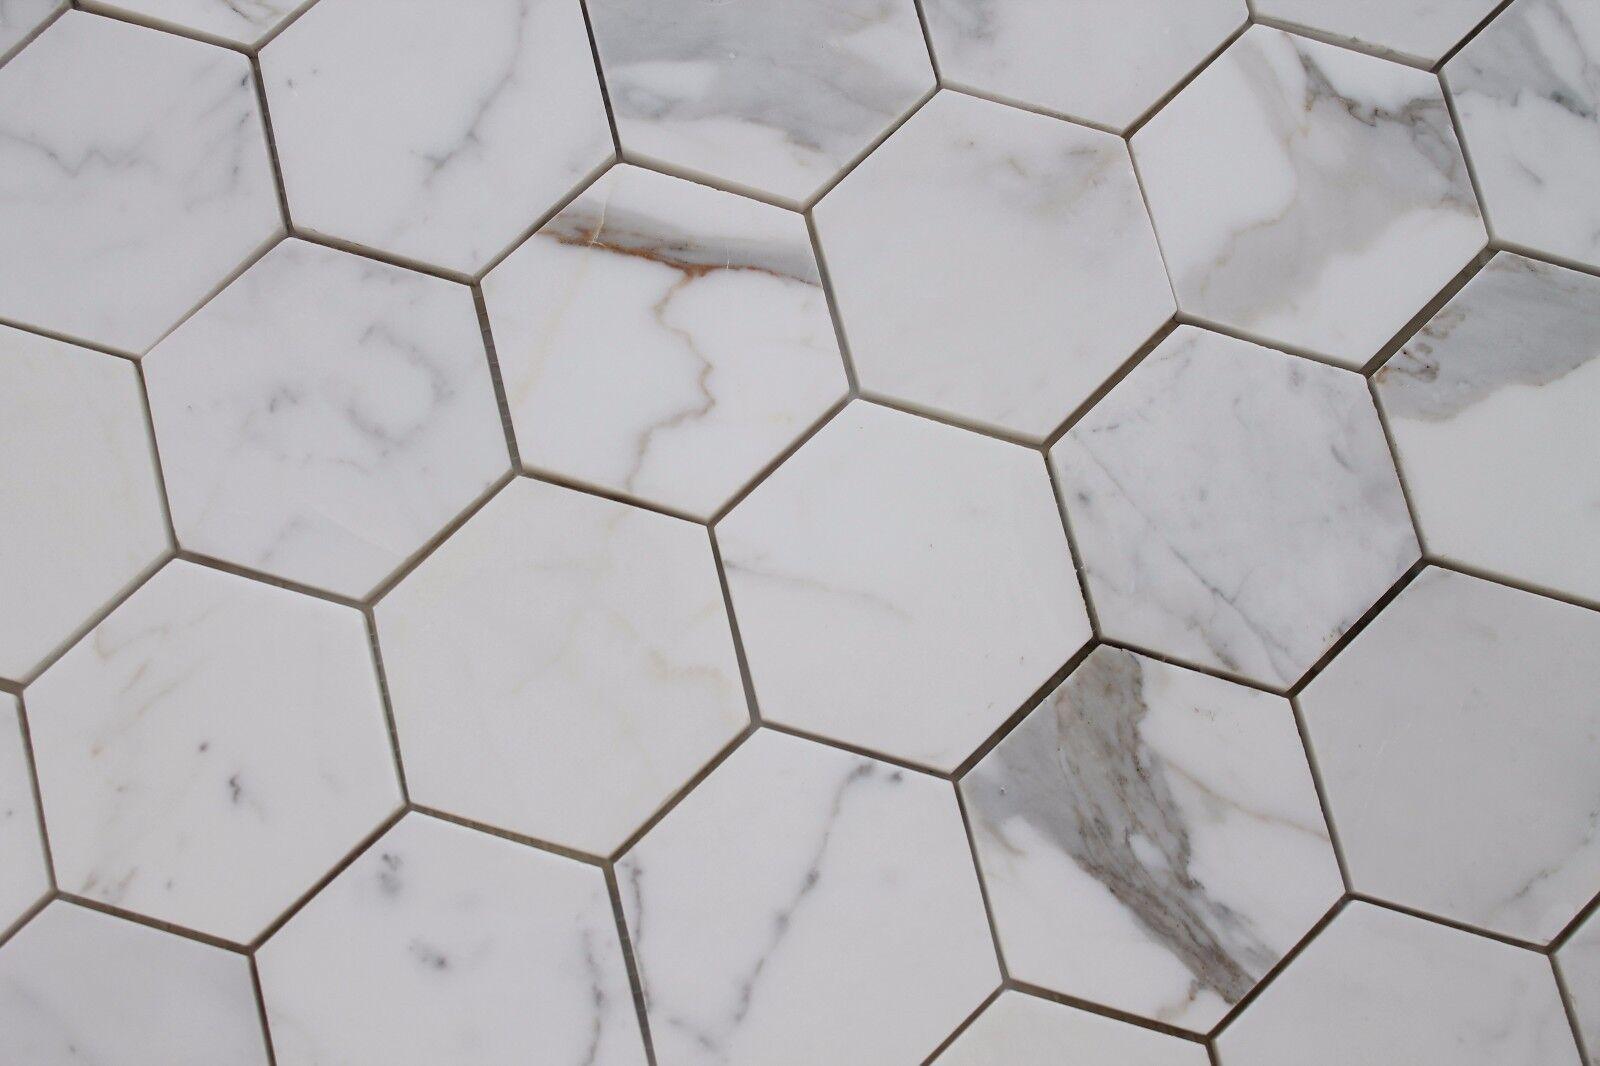 Calacatta Gold 4 Inch Hexagon Mosaic Tiles - Kitchen Backsplash ...